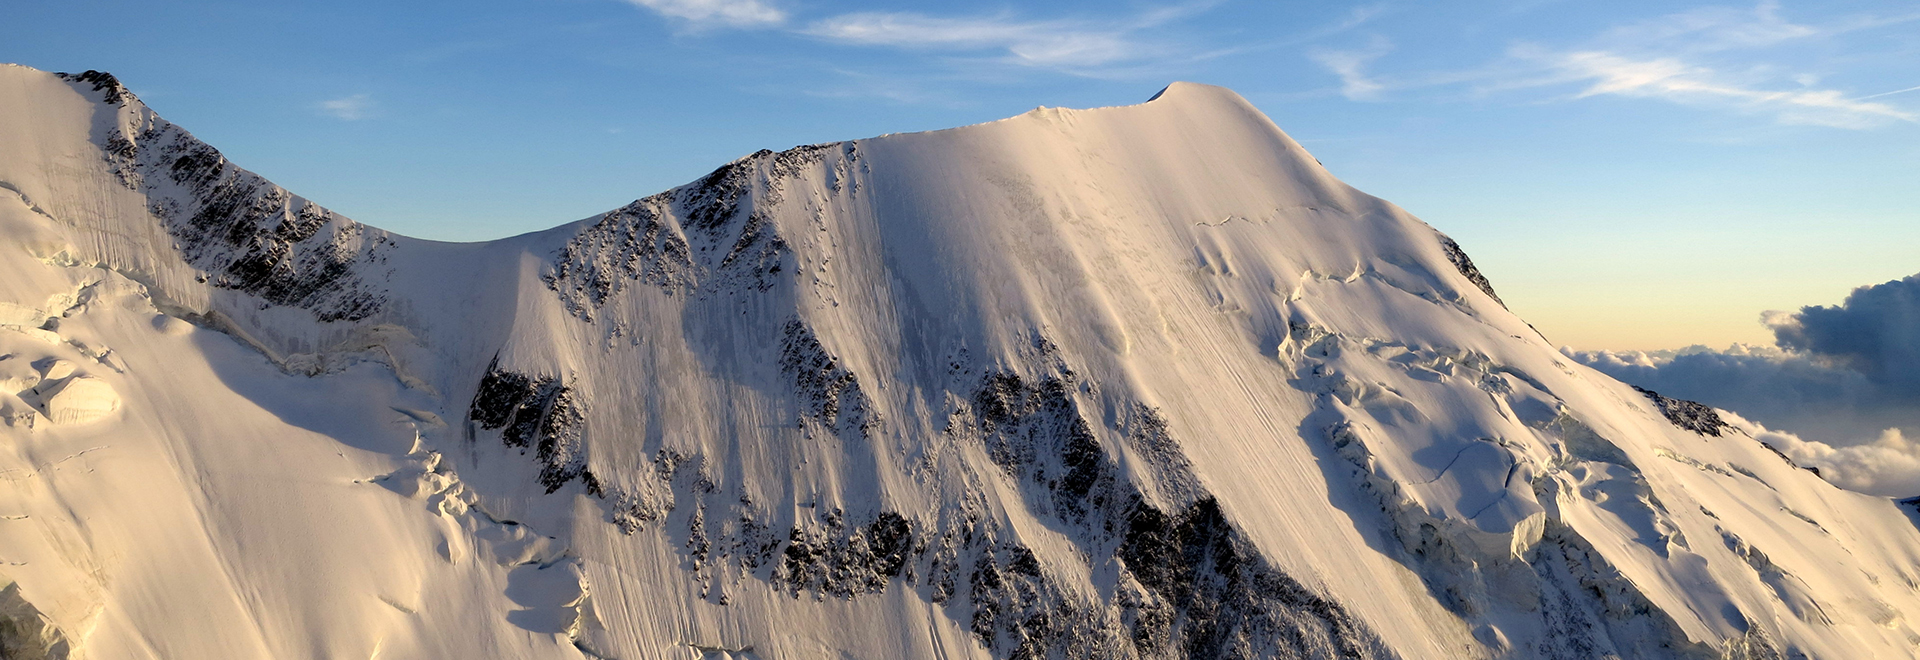 Monte Bianco Vie Normali